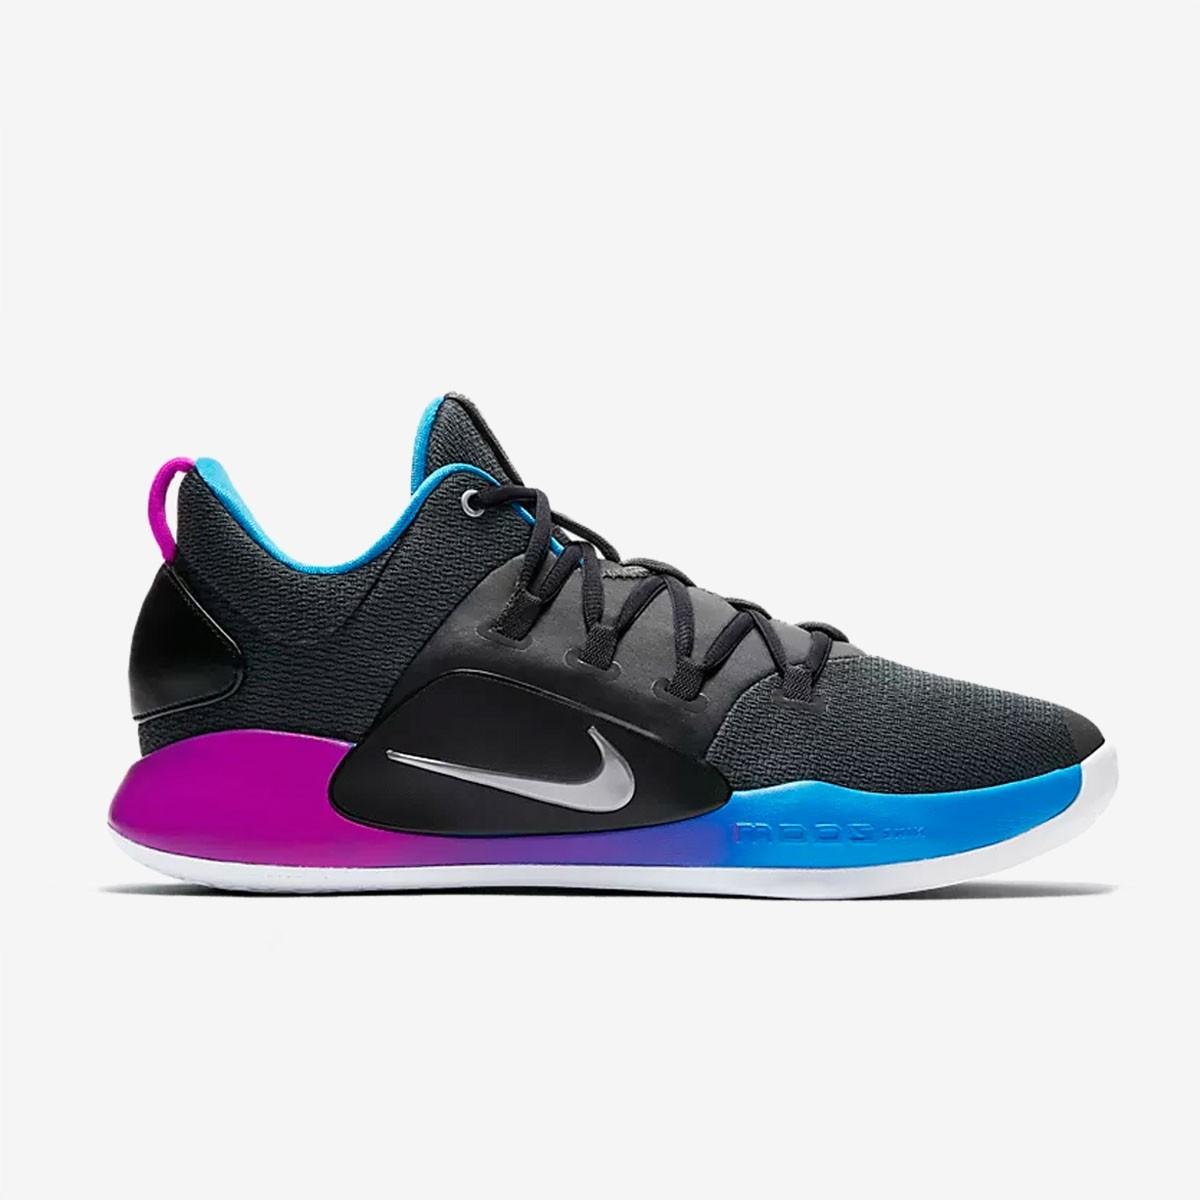 Nike Hyperdunk X GS Low 2018 'Huarache'